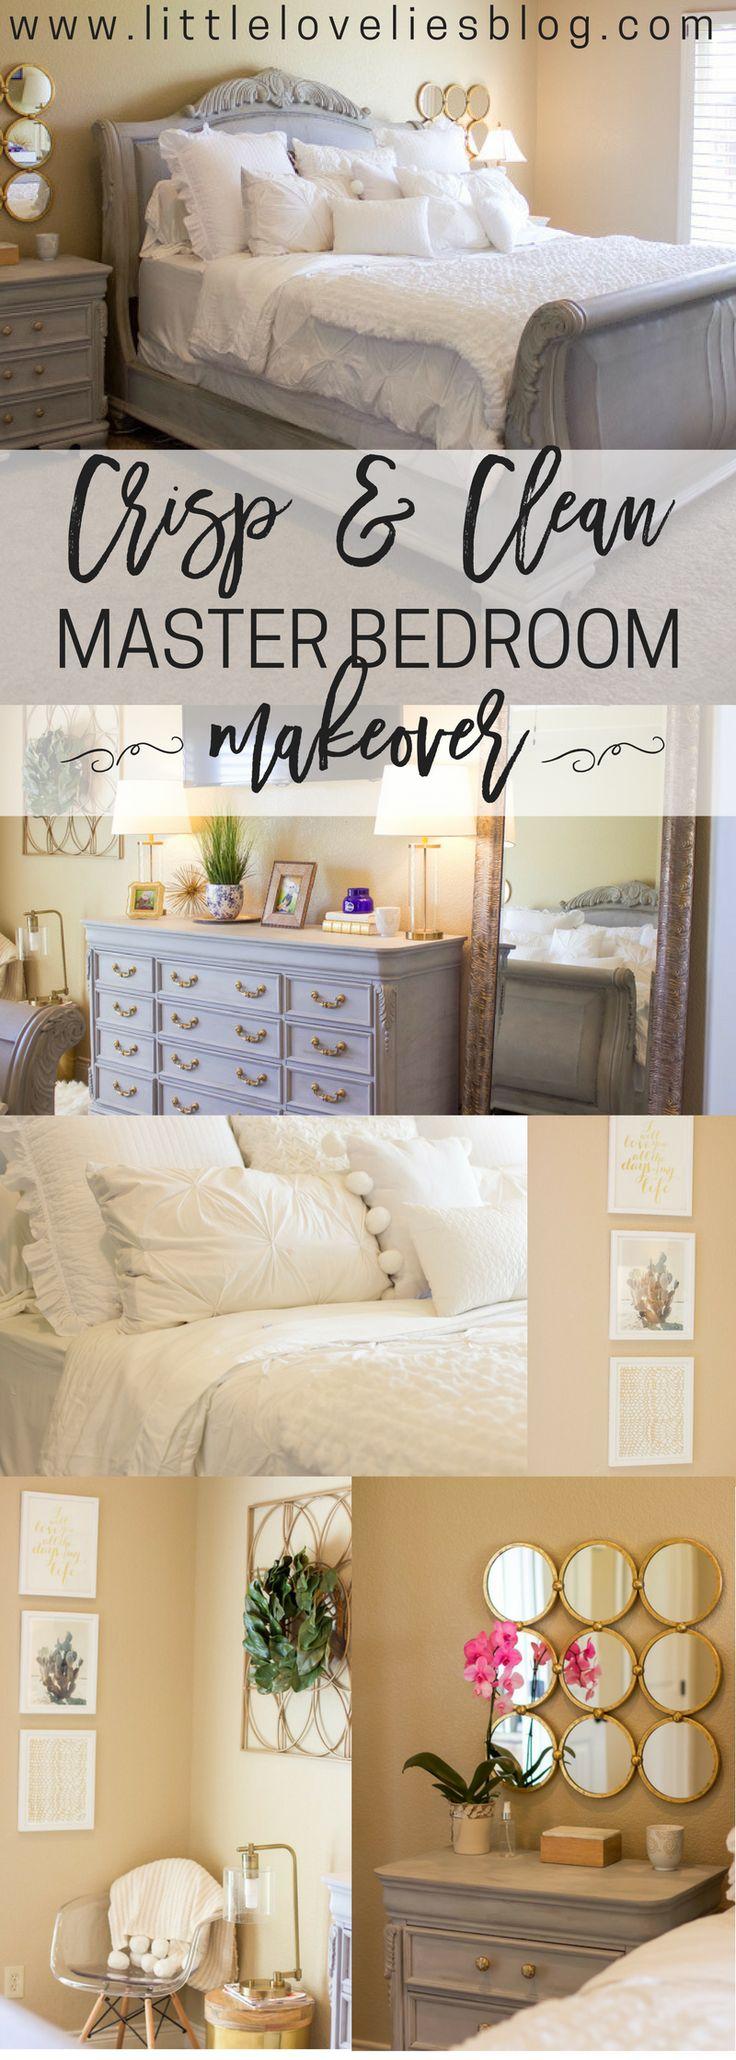 crisp-and-clean-master-bedroom-makeover